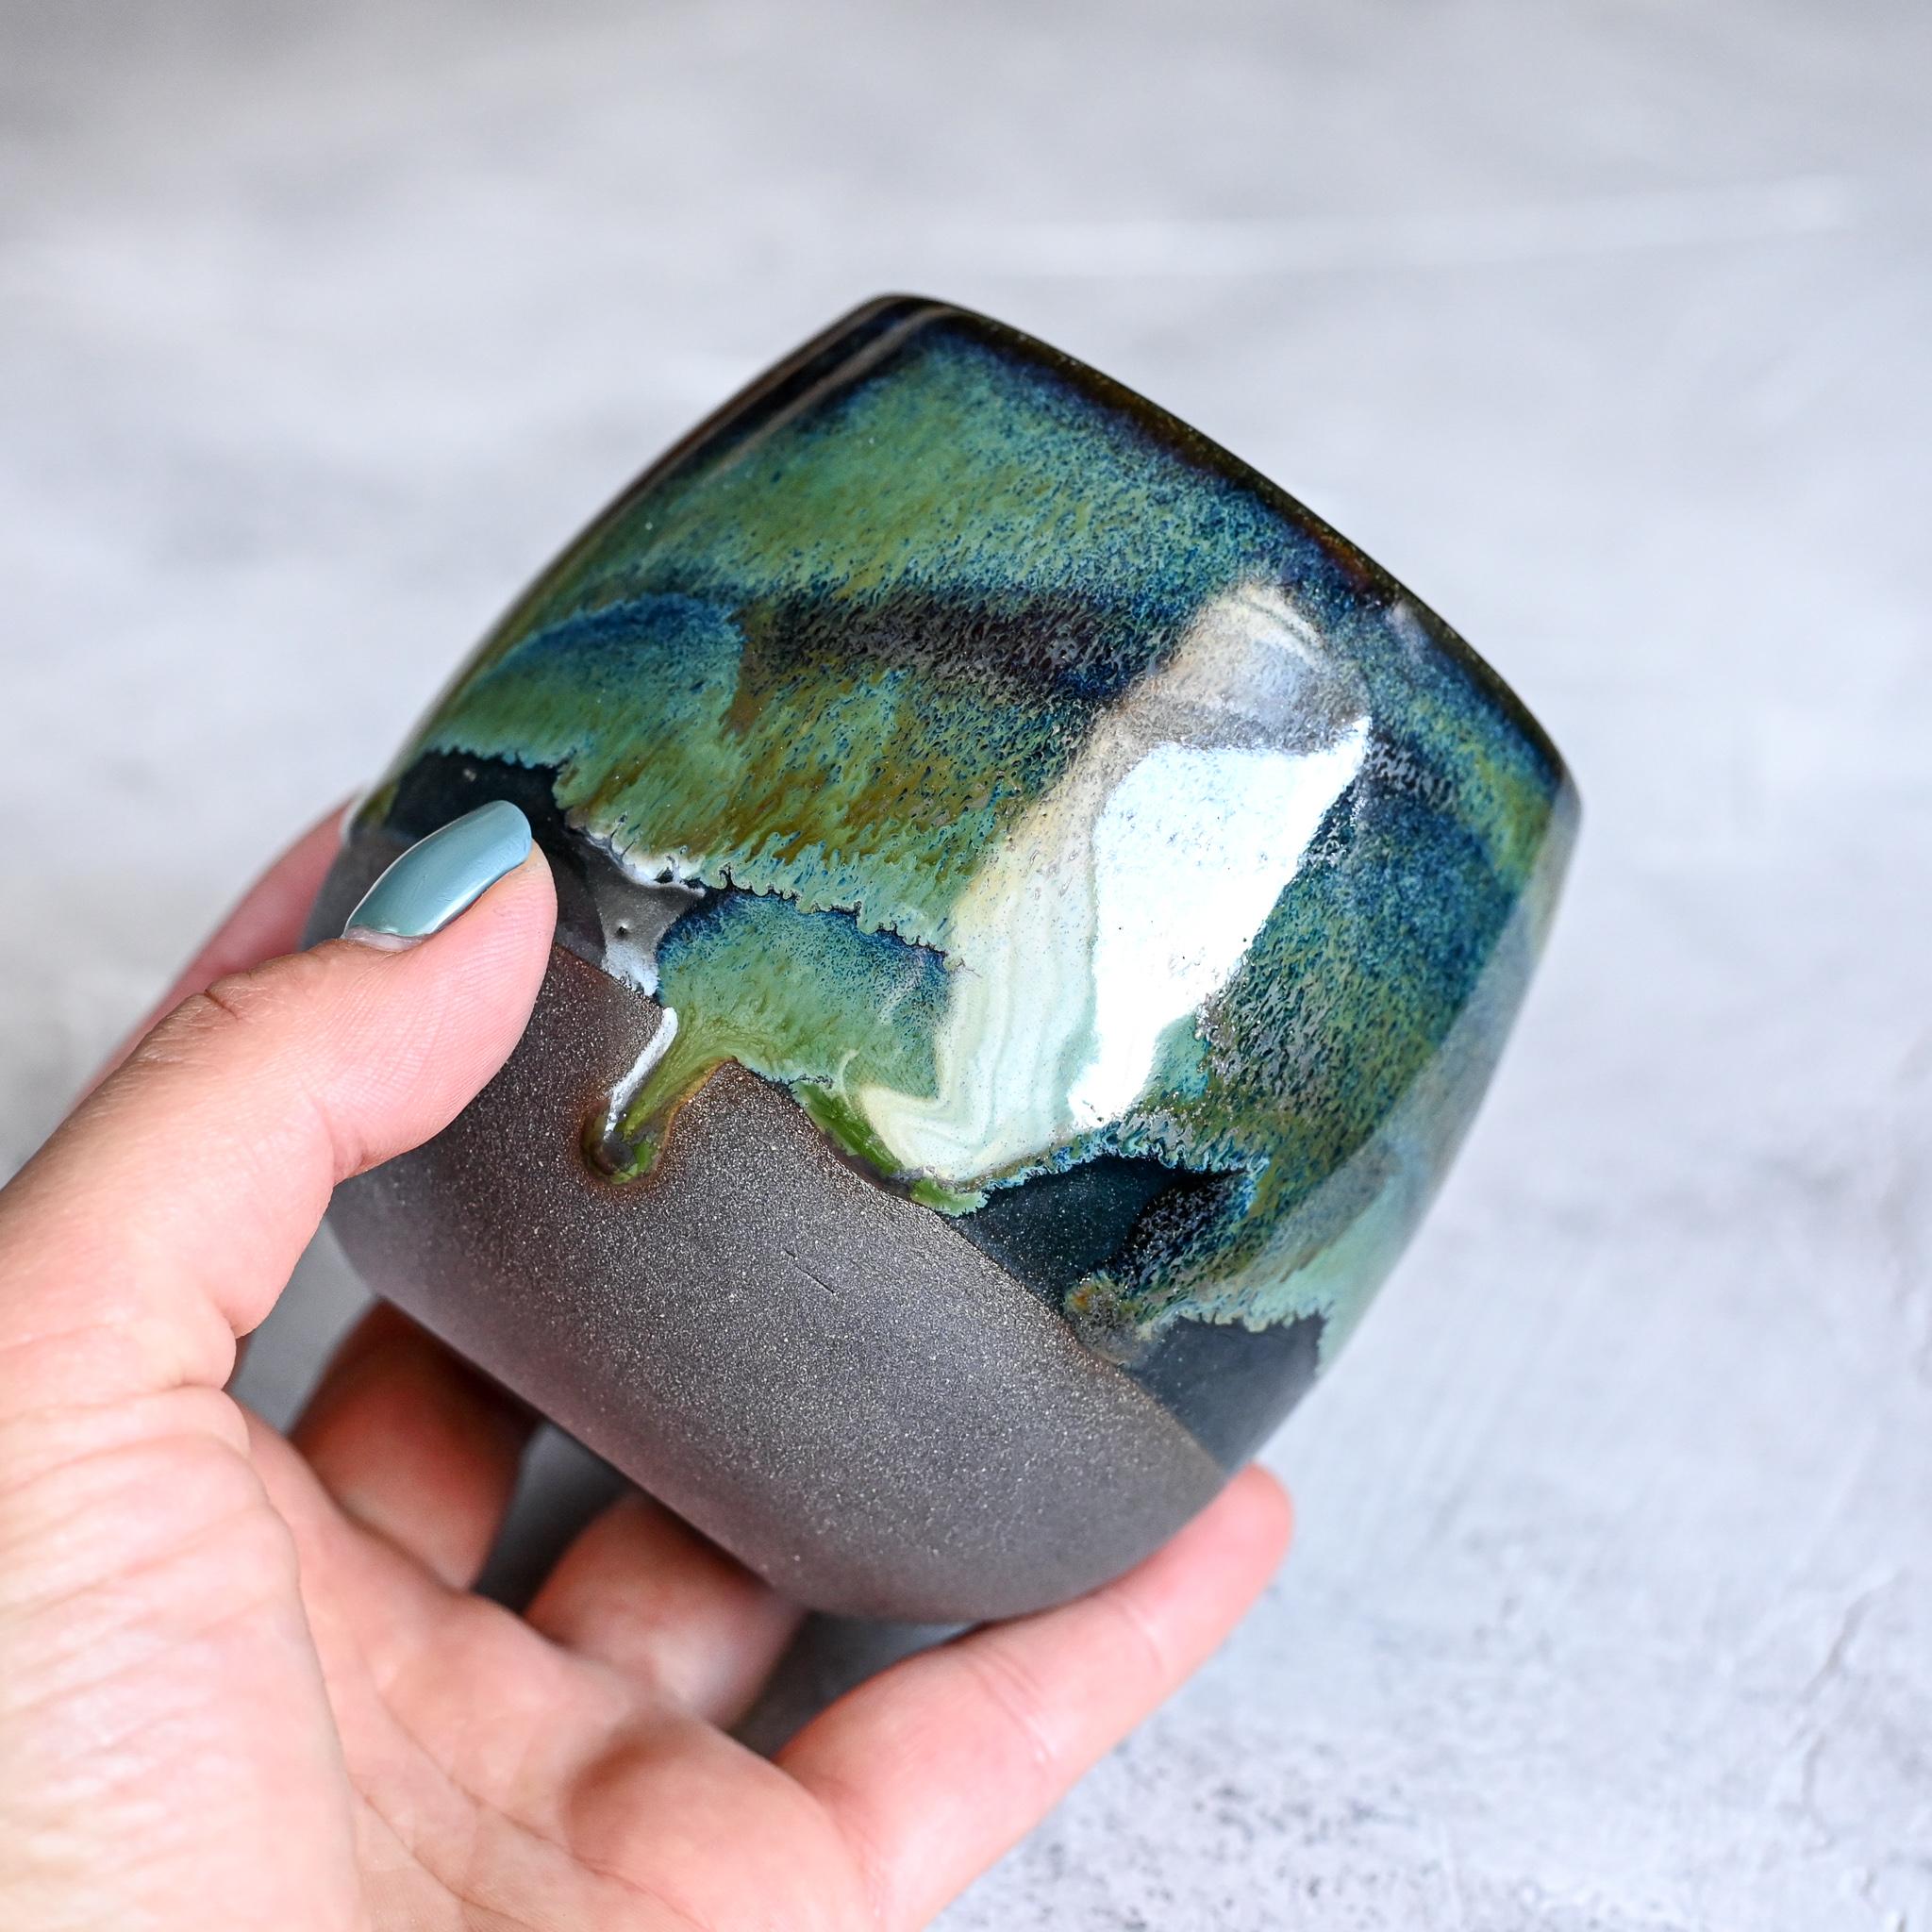 картинка Керамический стакан Марии Левиной 20 - DishWishes.Ru